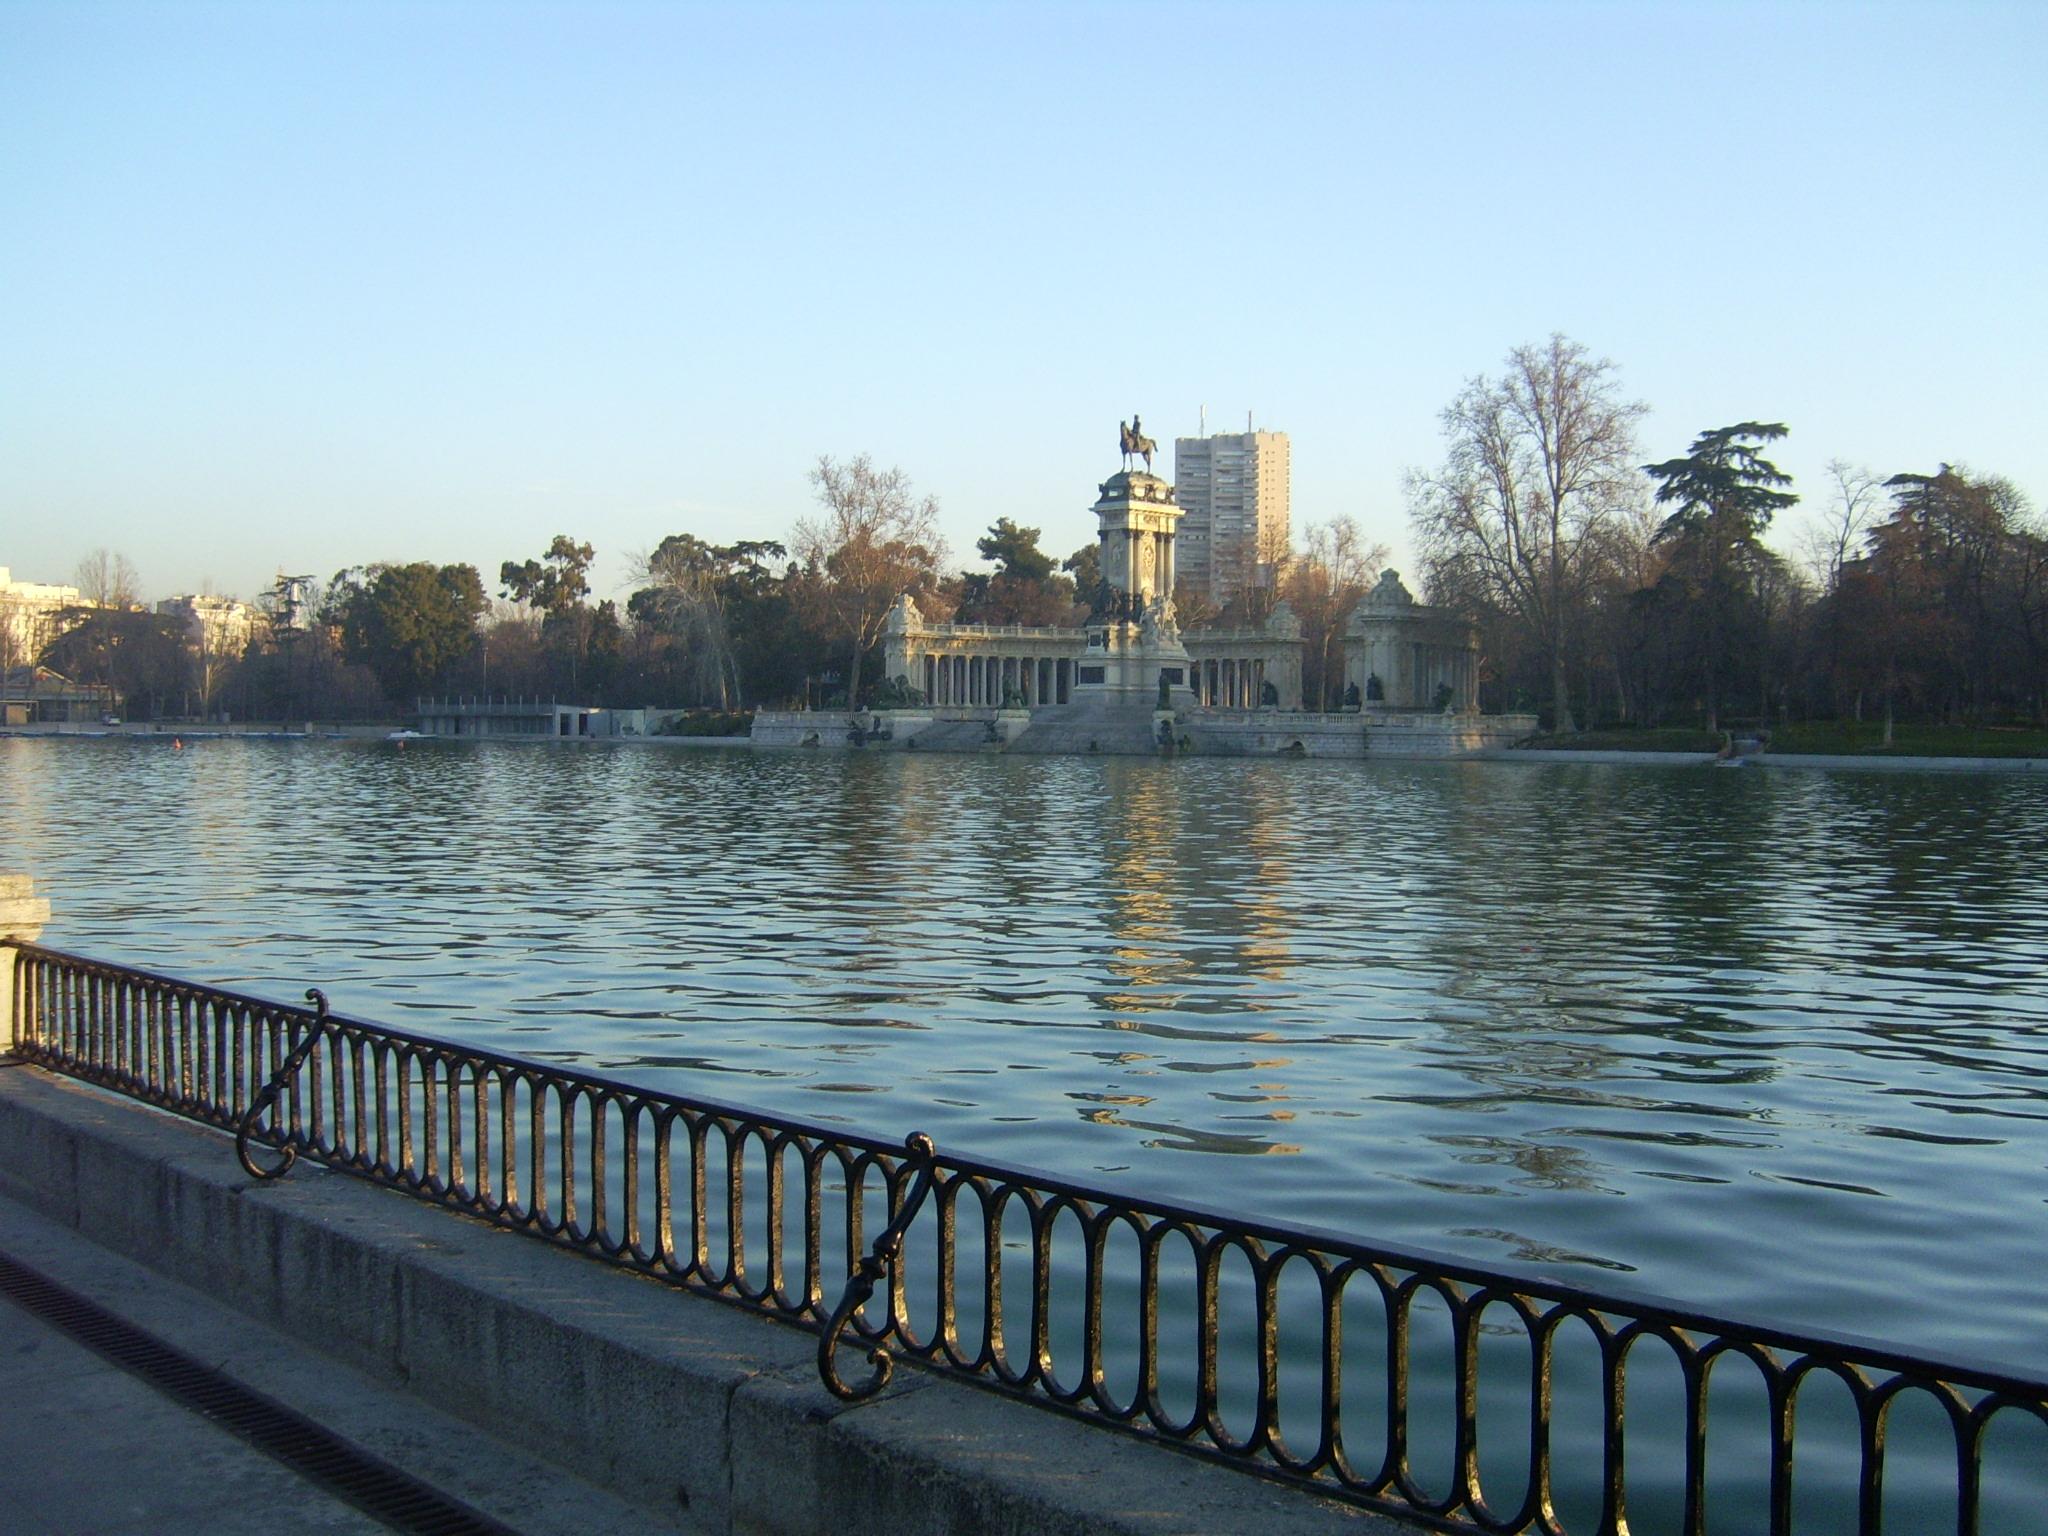 Parque del Retiro Madrid, Fence, Lake, Landscape, Madrid, HQ Photo